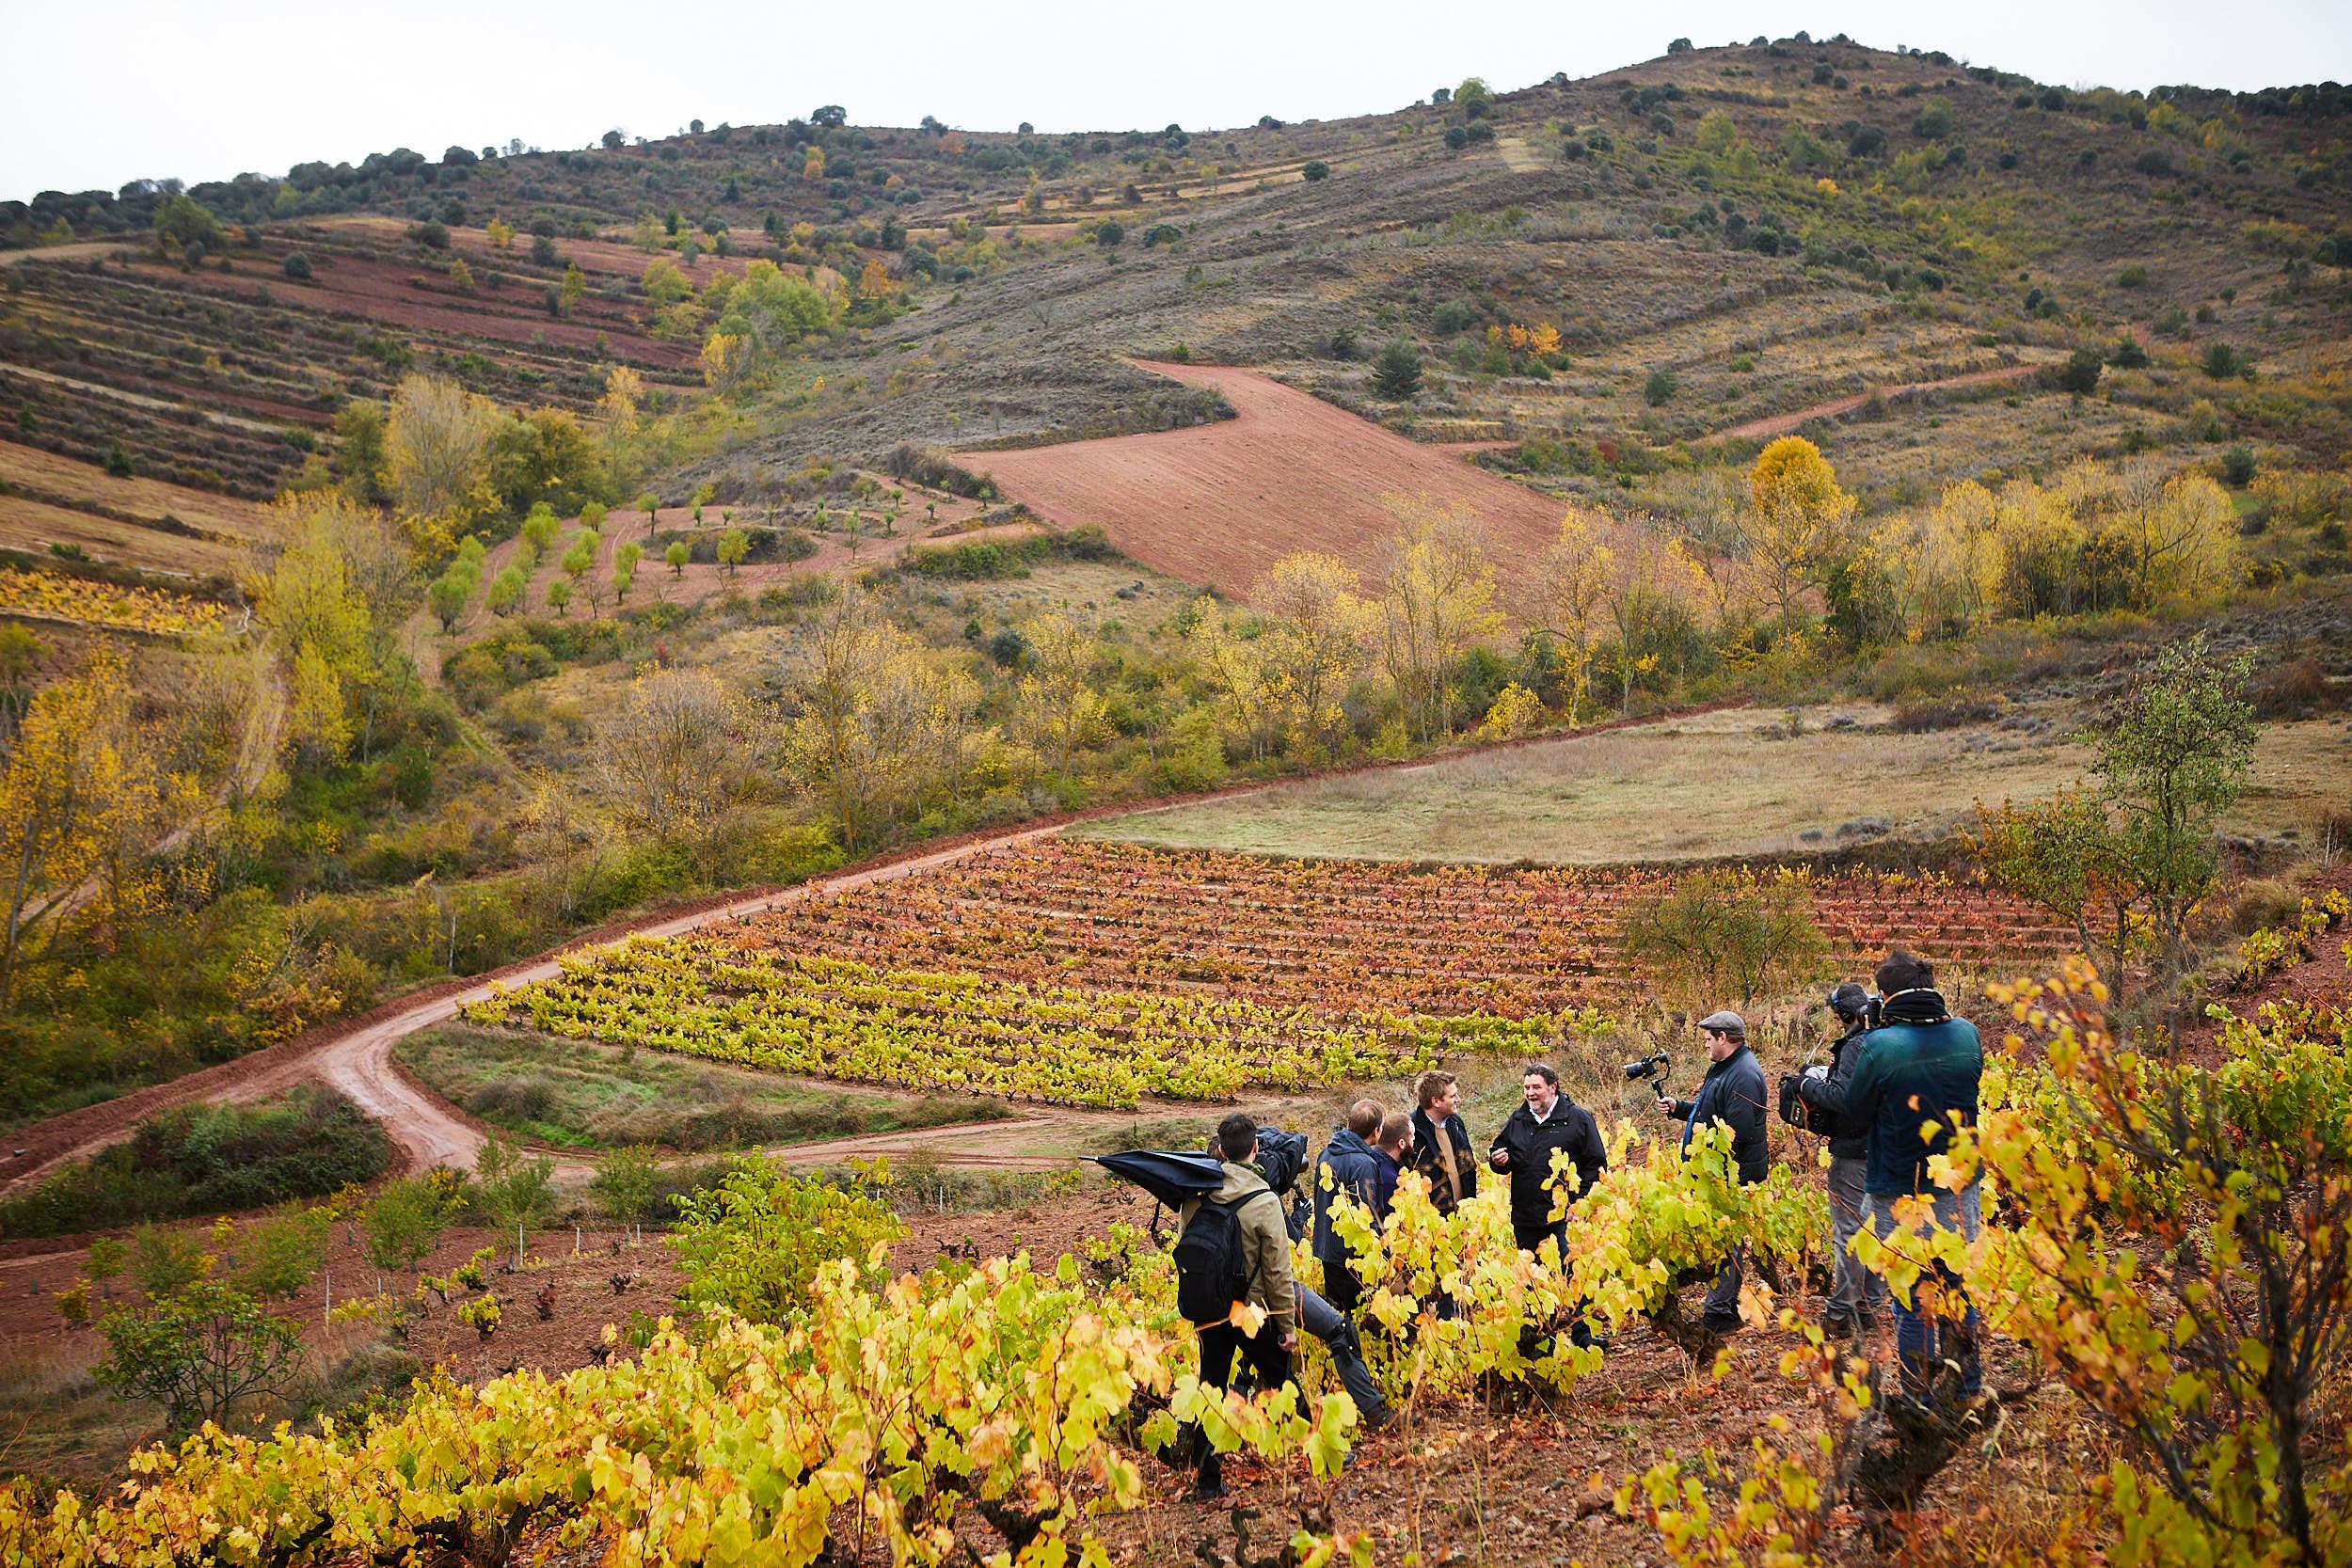 Fotografo_Profesional_La_Rioja_Pais_Vasco_Spain_Chef_Curtis_Stone_Sturcke_009.jpg